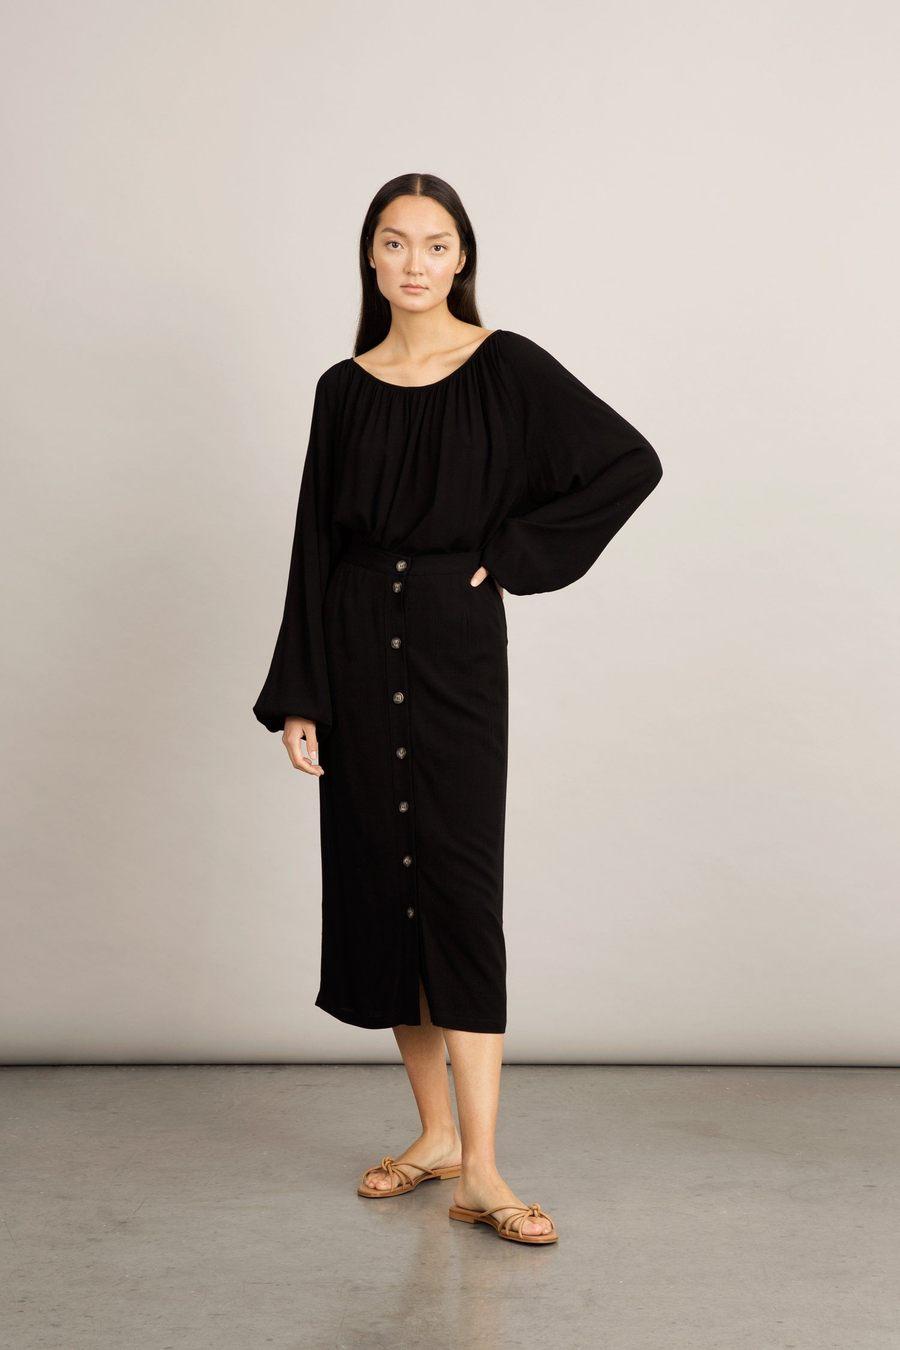 stadera-top-black-top-stylein-150943_900x.jpg